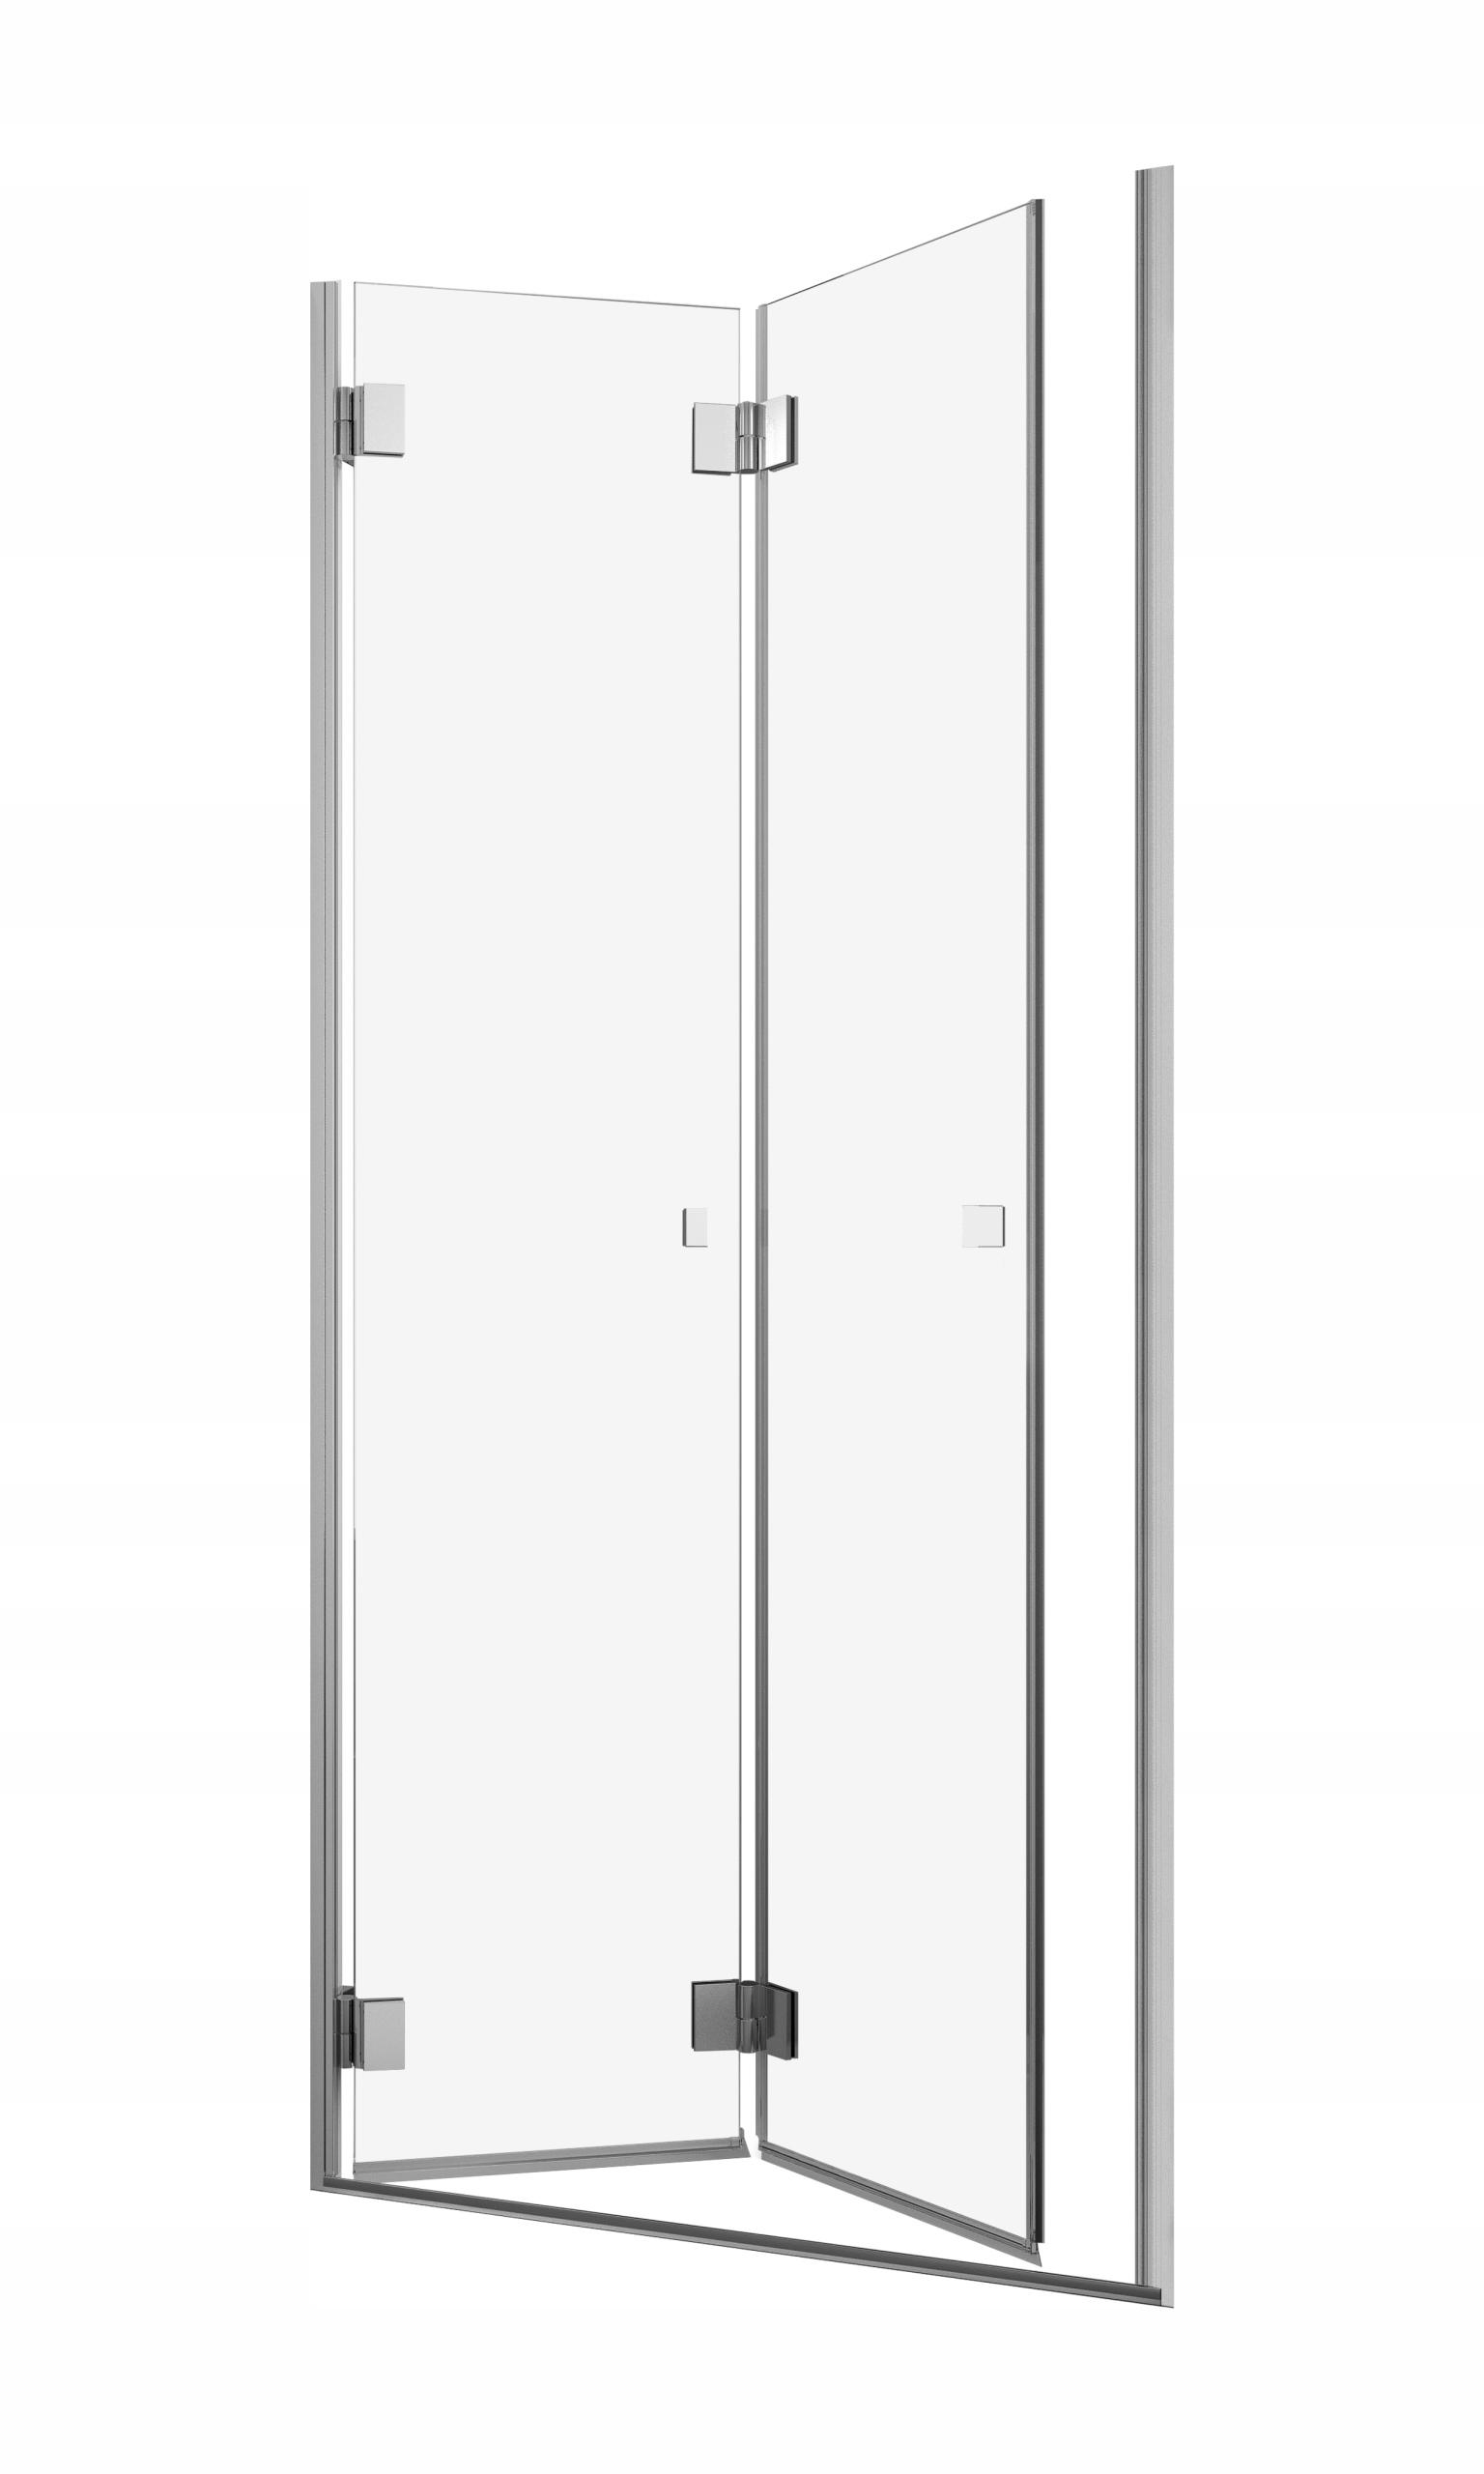 Carena DWB sprchové dvere 70x195 cm RADAWAY